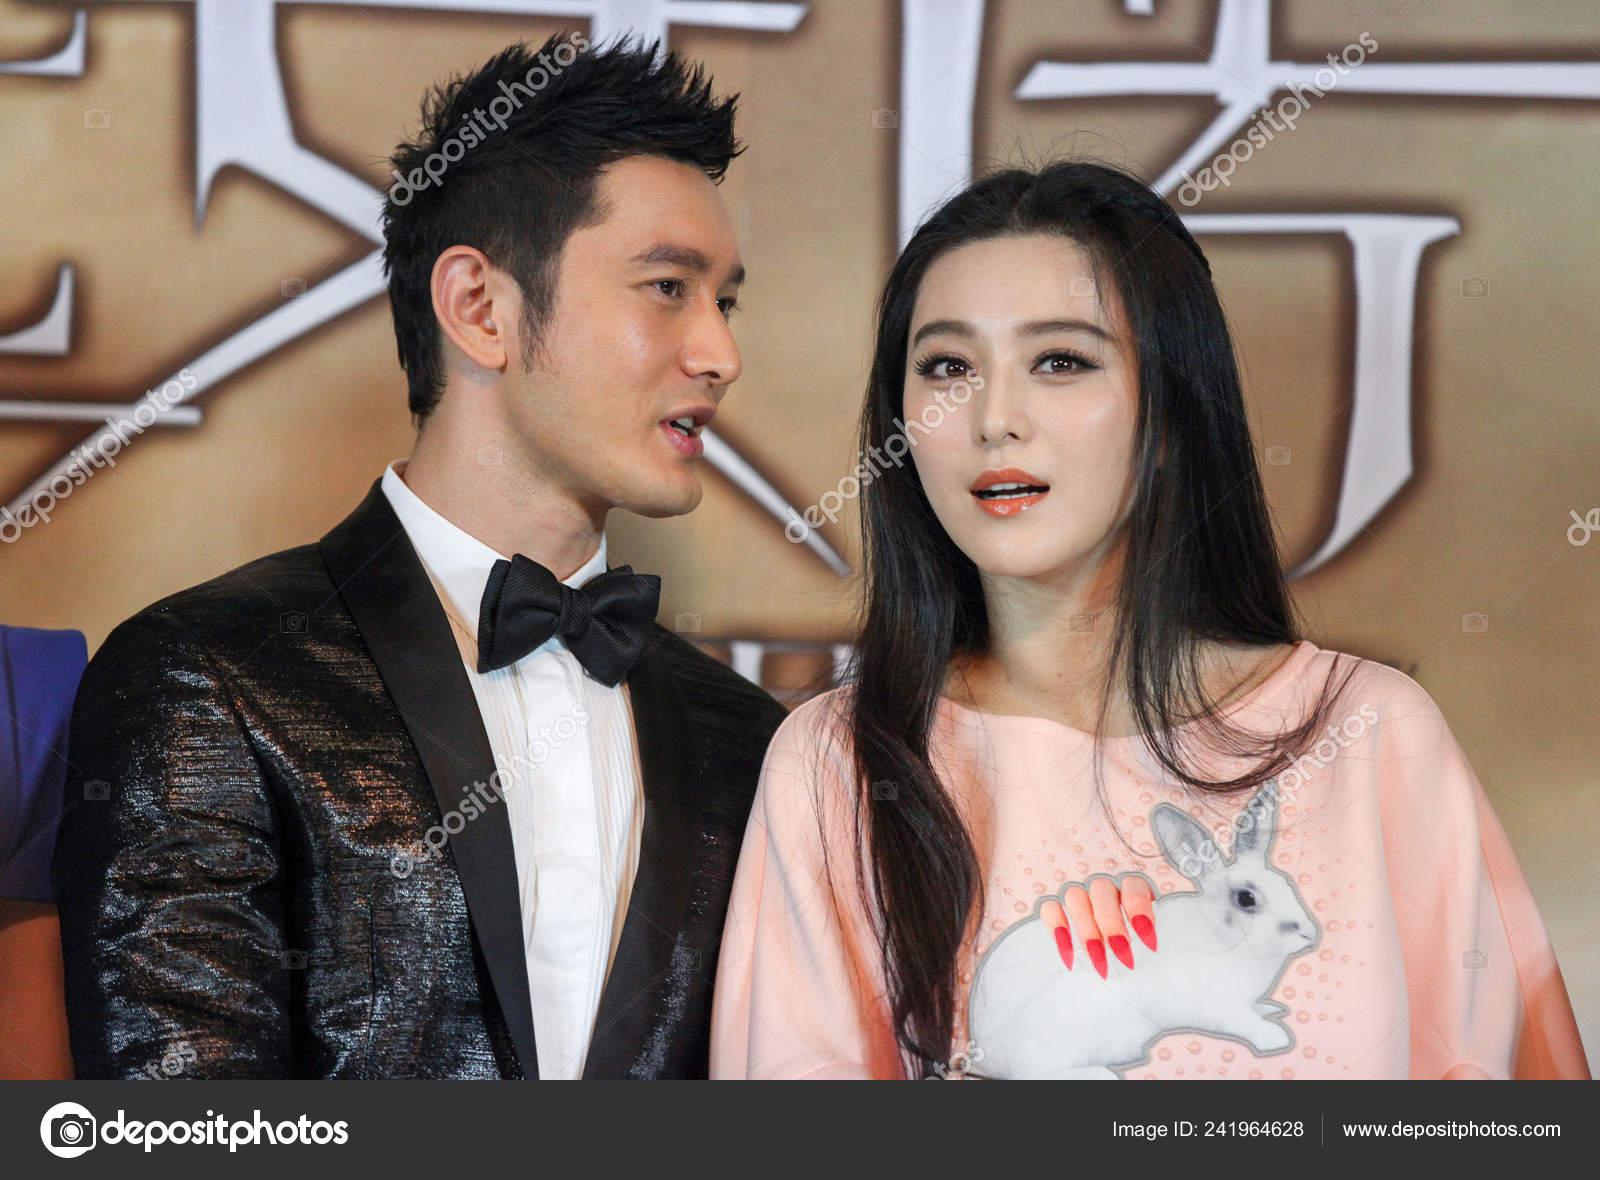 Xiaoming huang Yahoo is